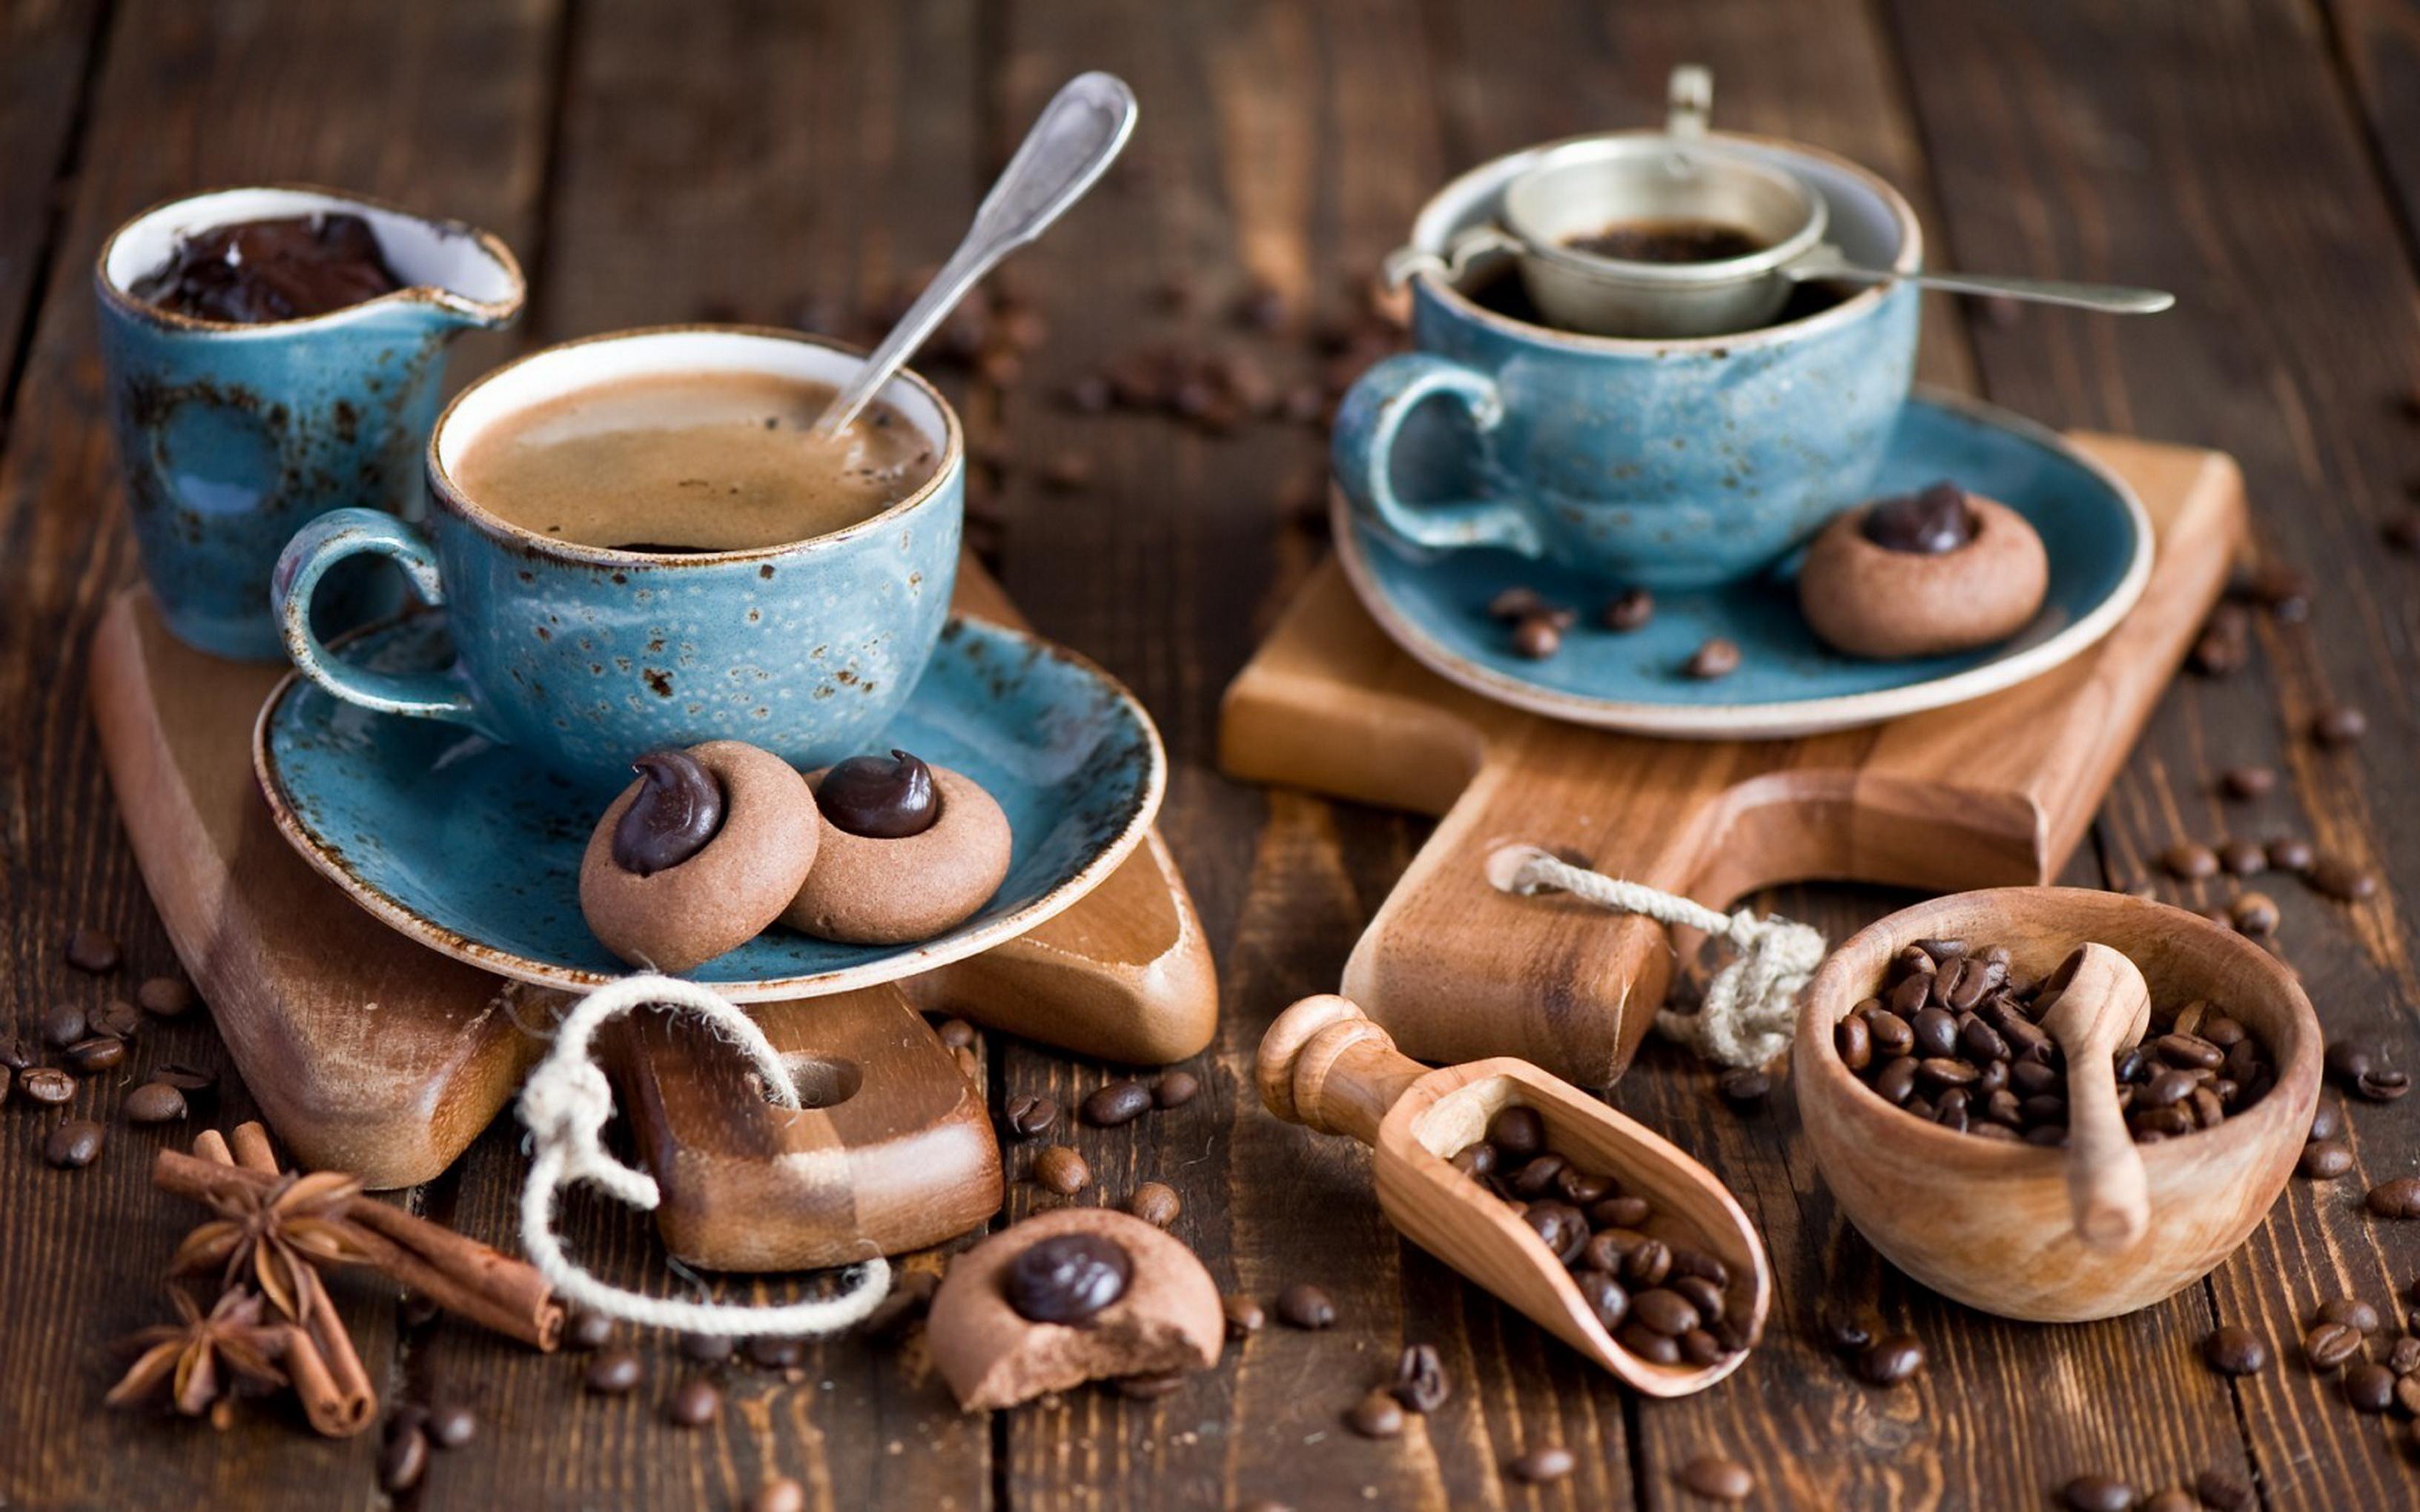 Картинки чашки с кофе